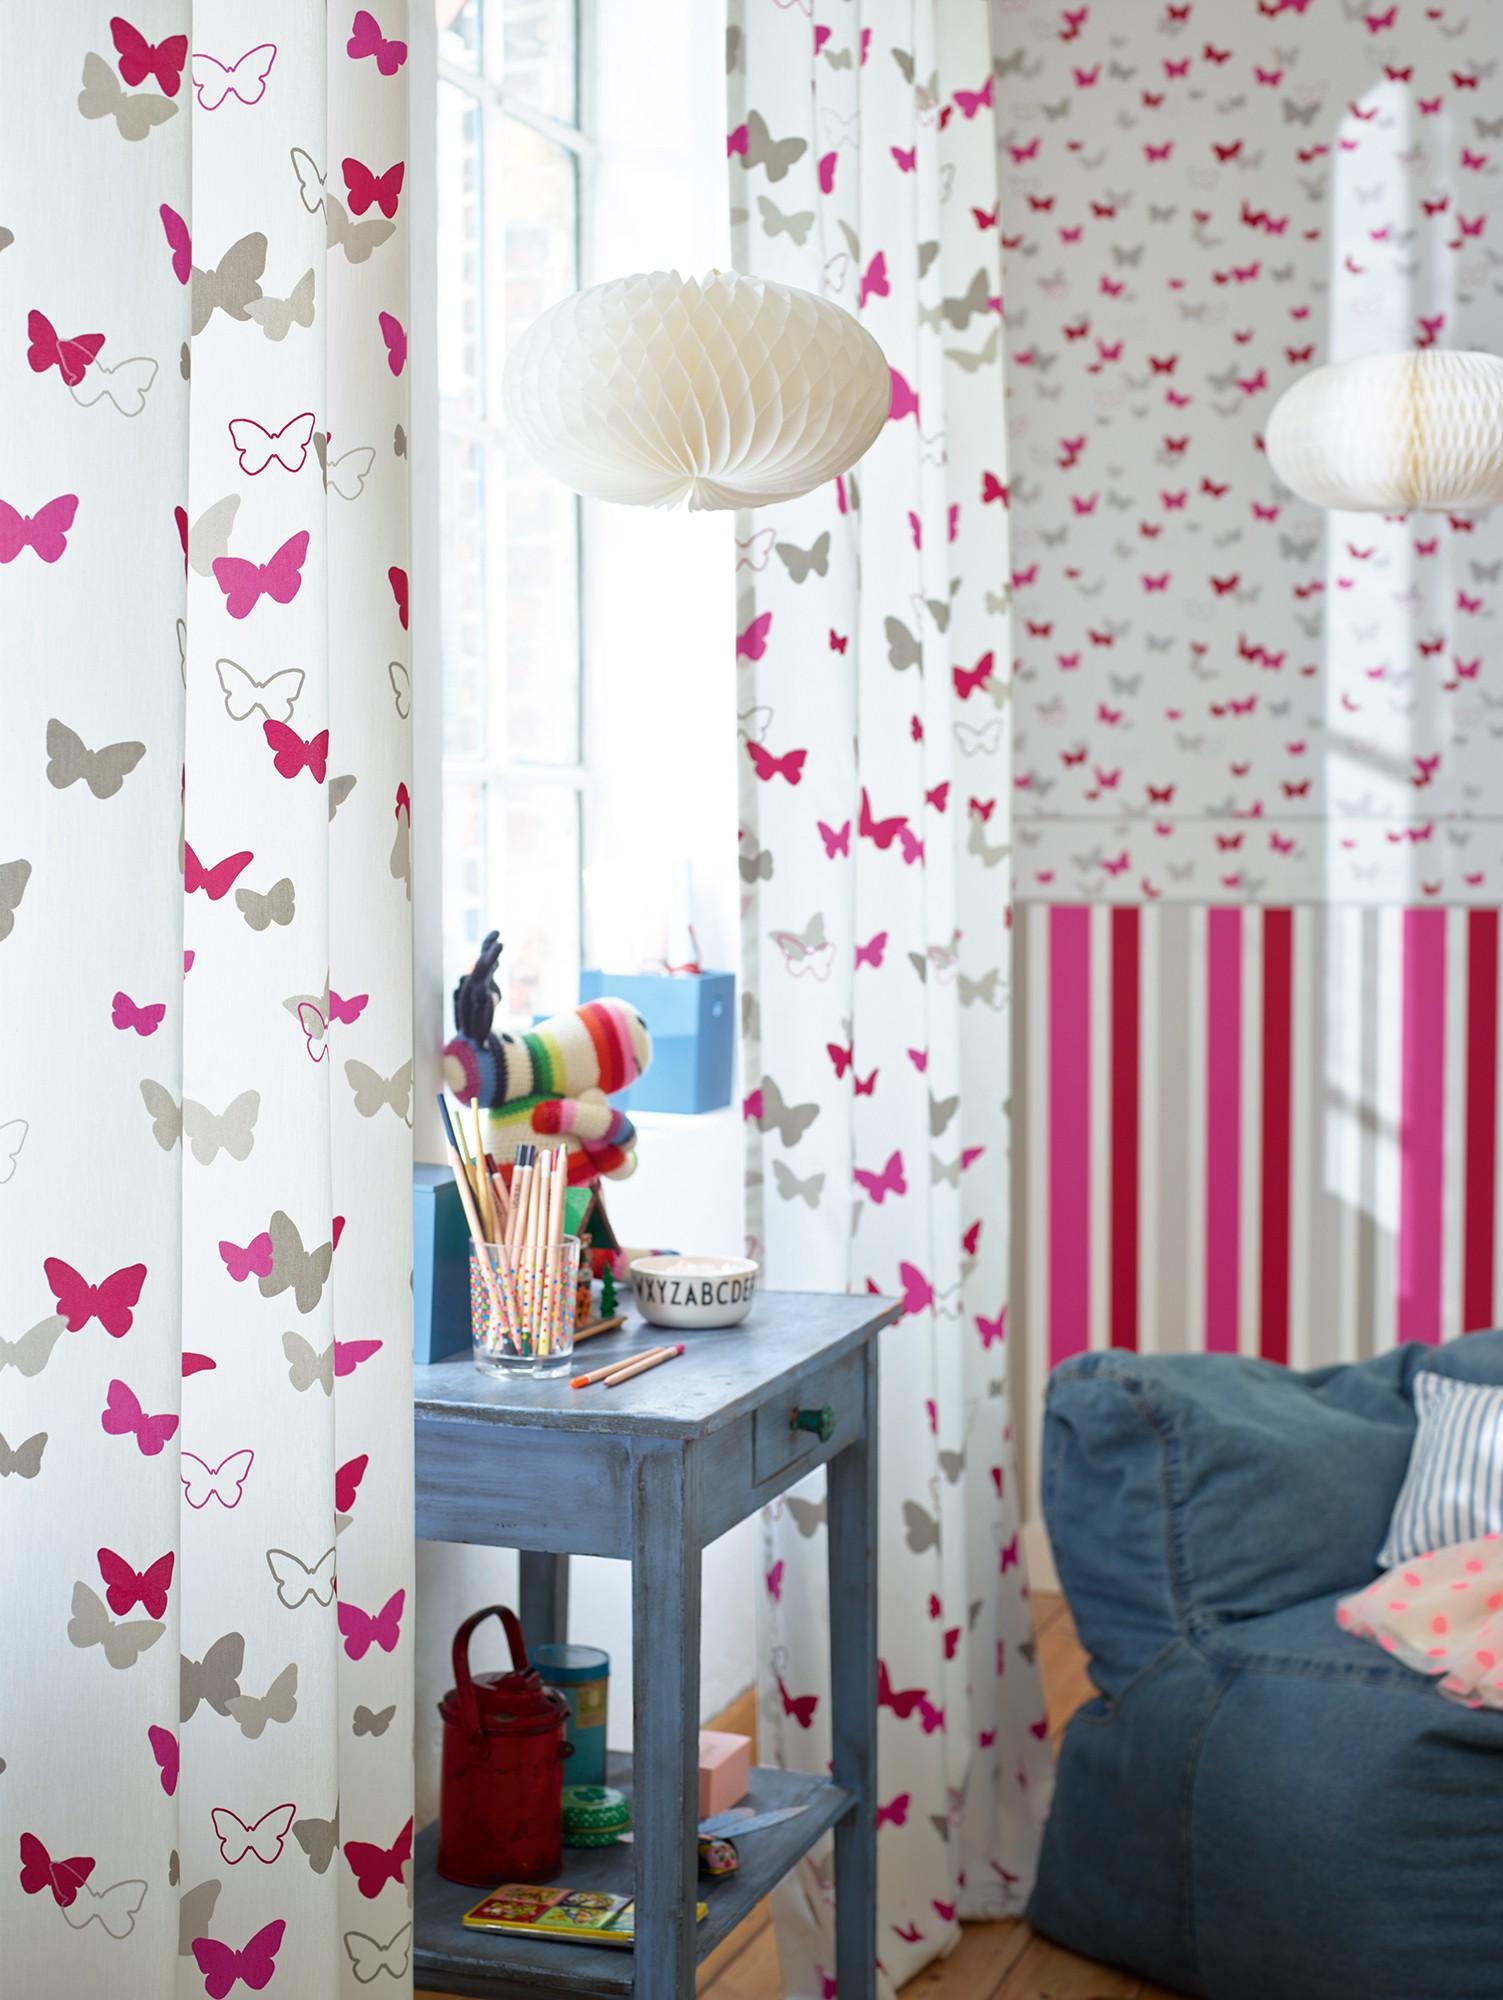 Kinderzimmer Tapete Schmetterling : Tapete Esprit Kids Kinder Schmetterling wei? 30289-2